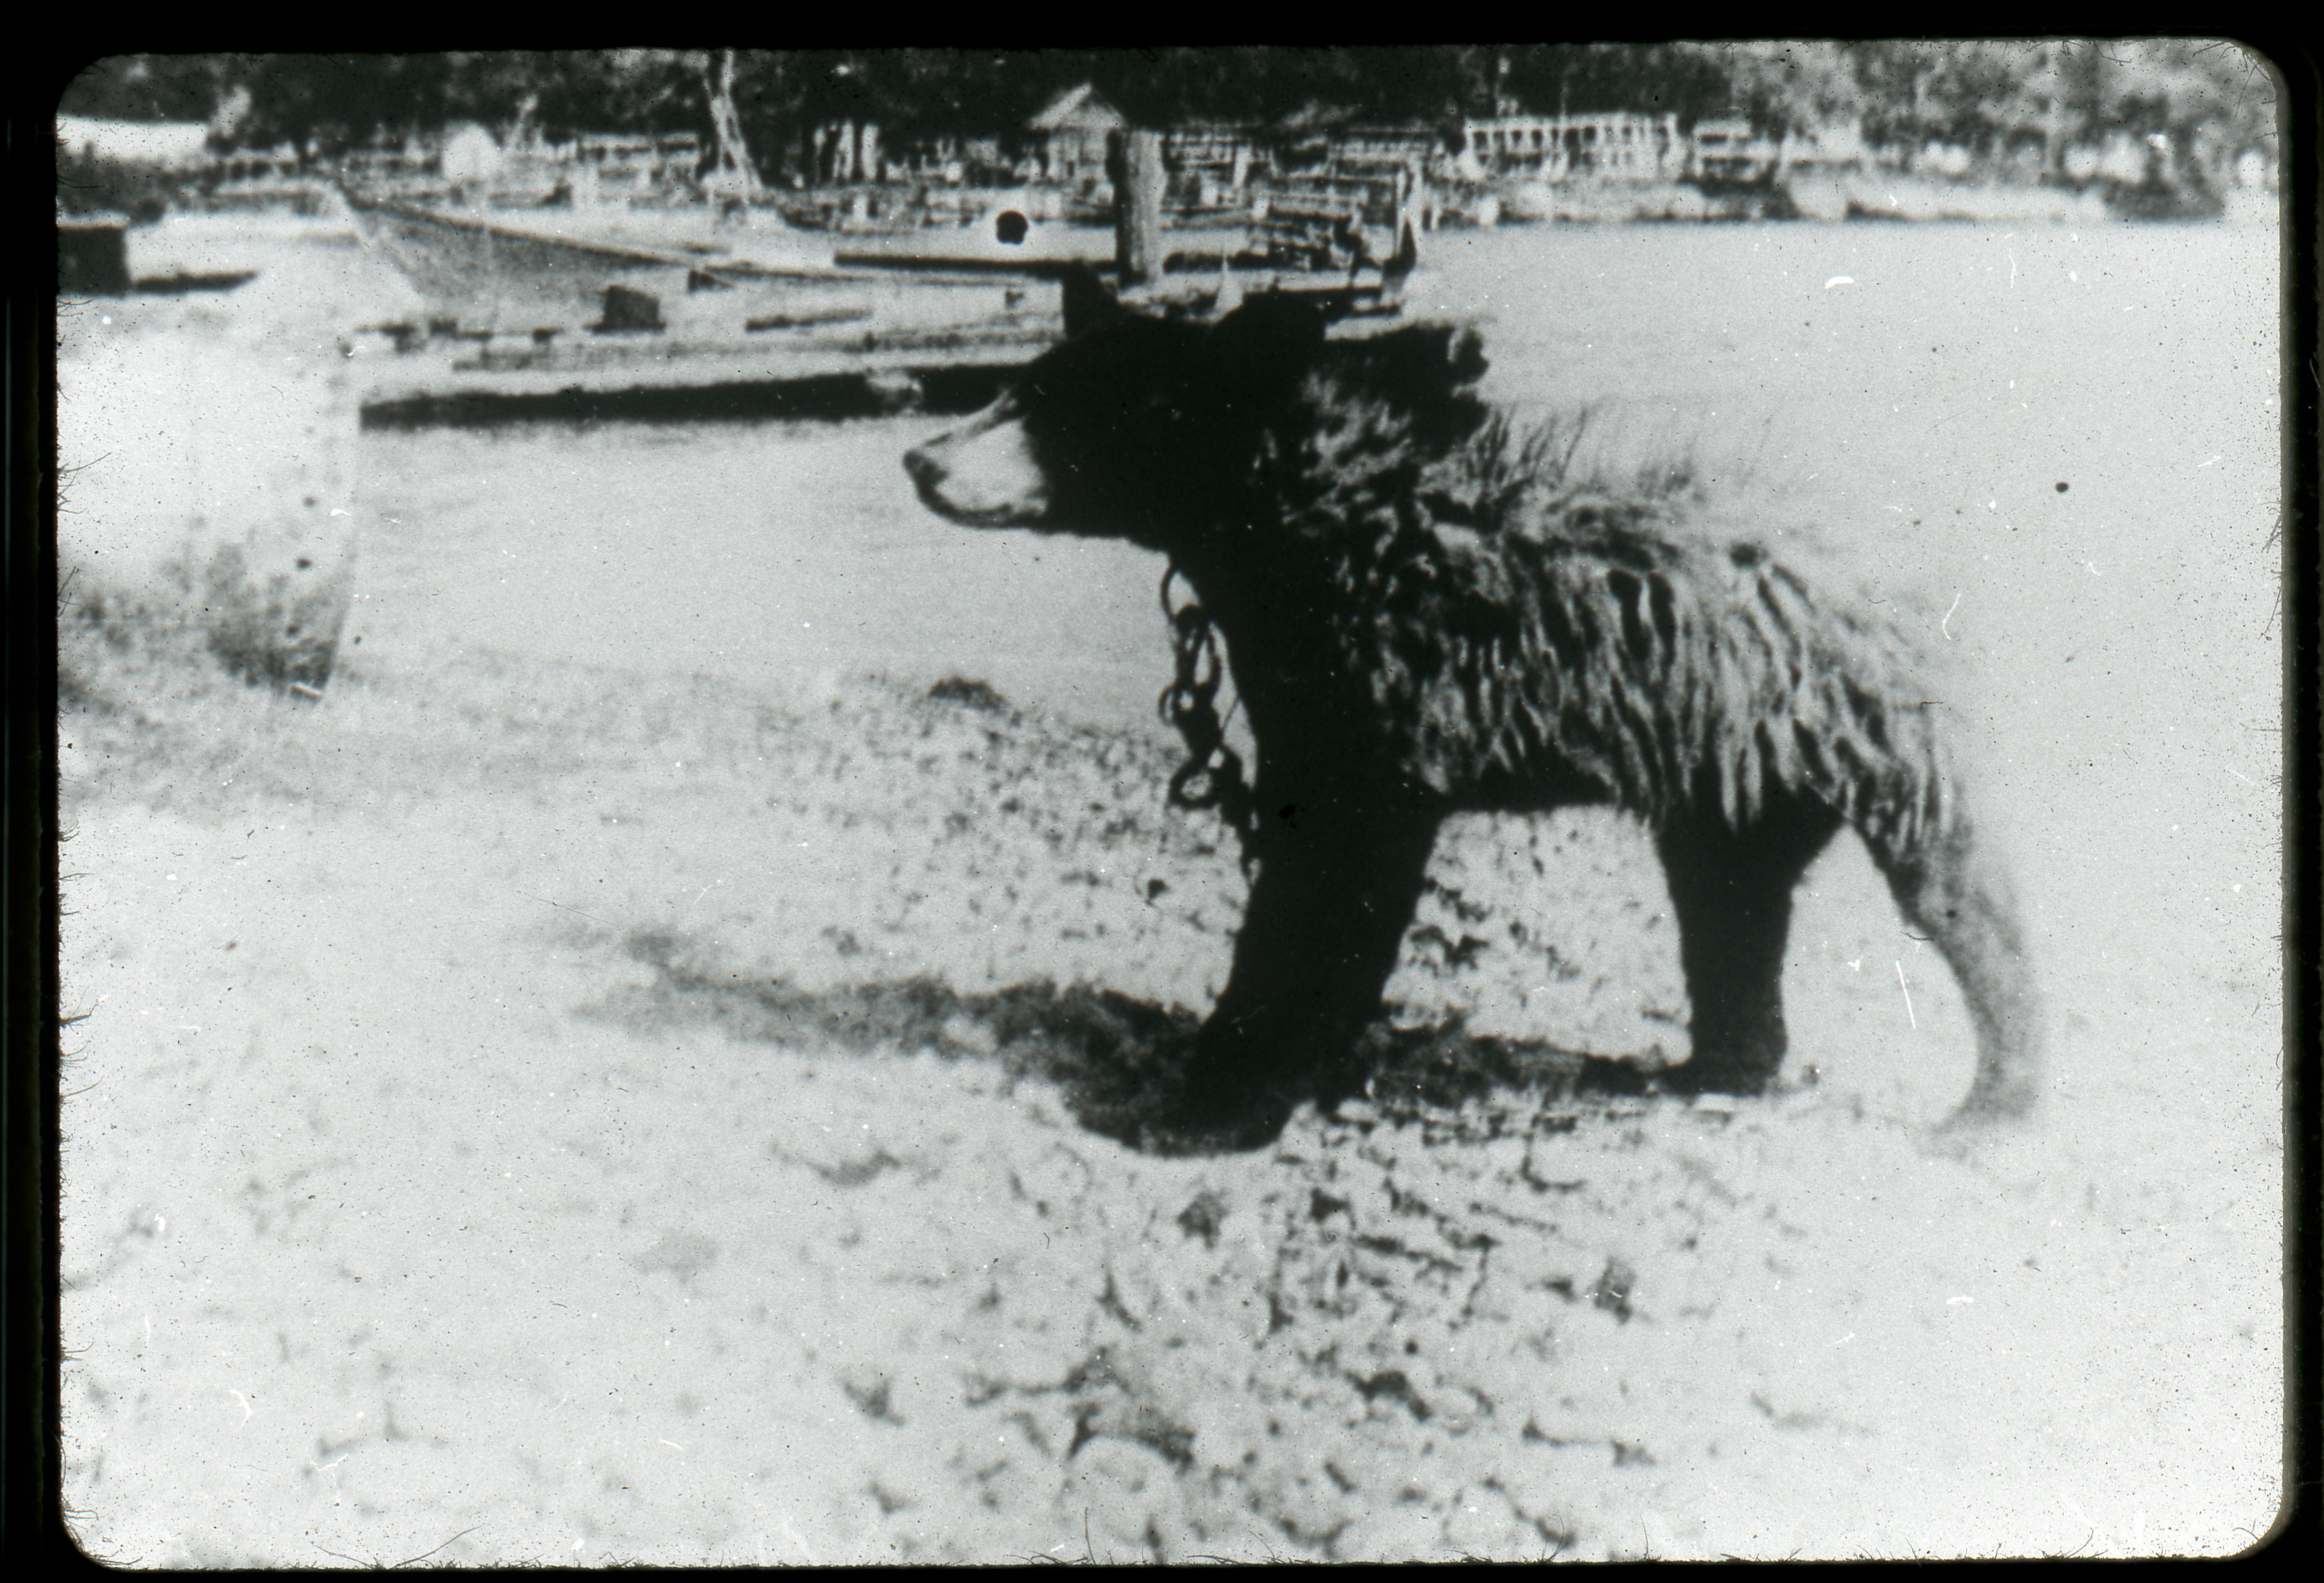 Bear on Main Duck Island, Osborne Collection.